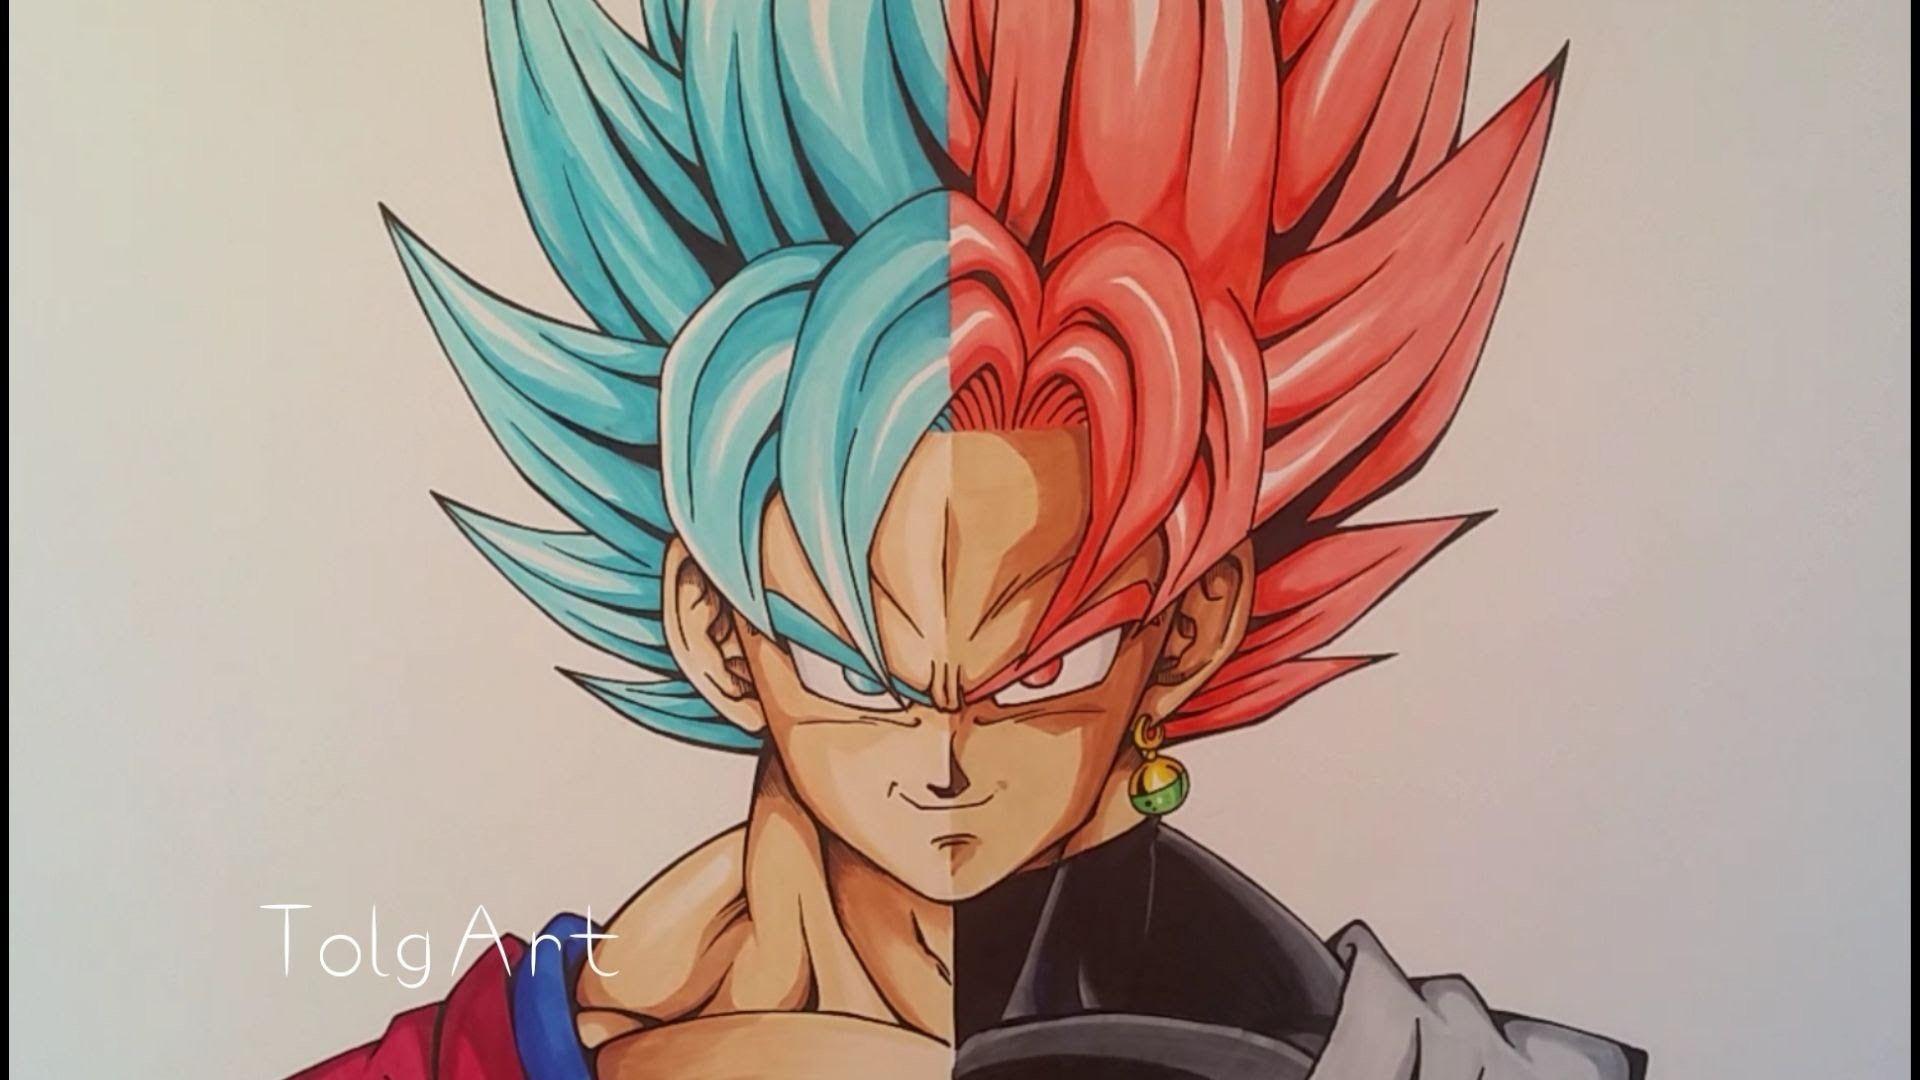 Drawing Goku Vs Black Goku Super Saiyan Blue Vs Rose Tolgart 40 K Subs Goku Drawing Goku Super Saiyan Blue Super Saiyan Blue Kaioken